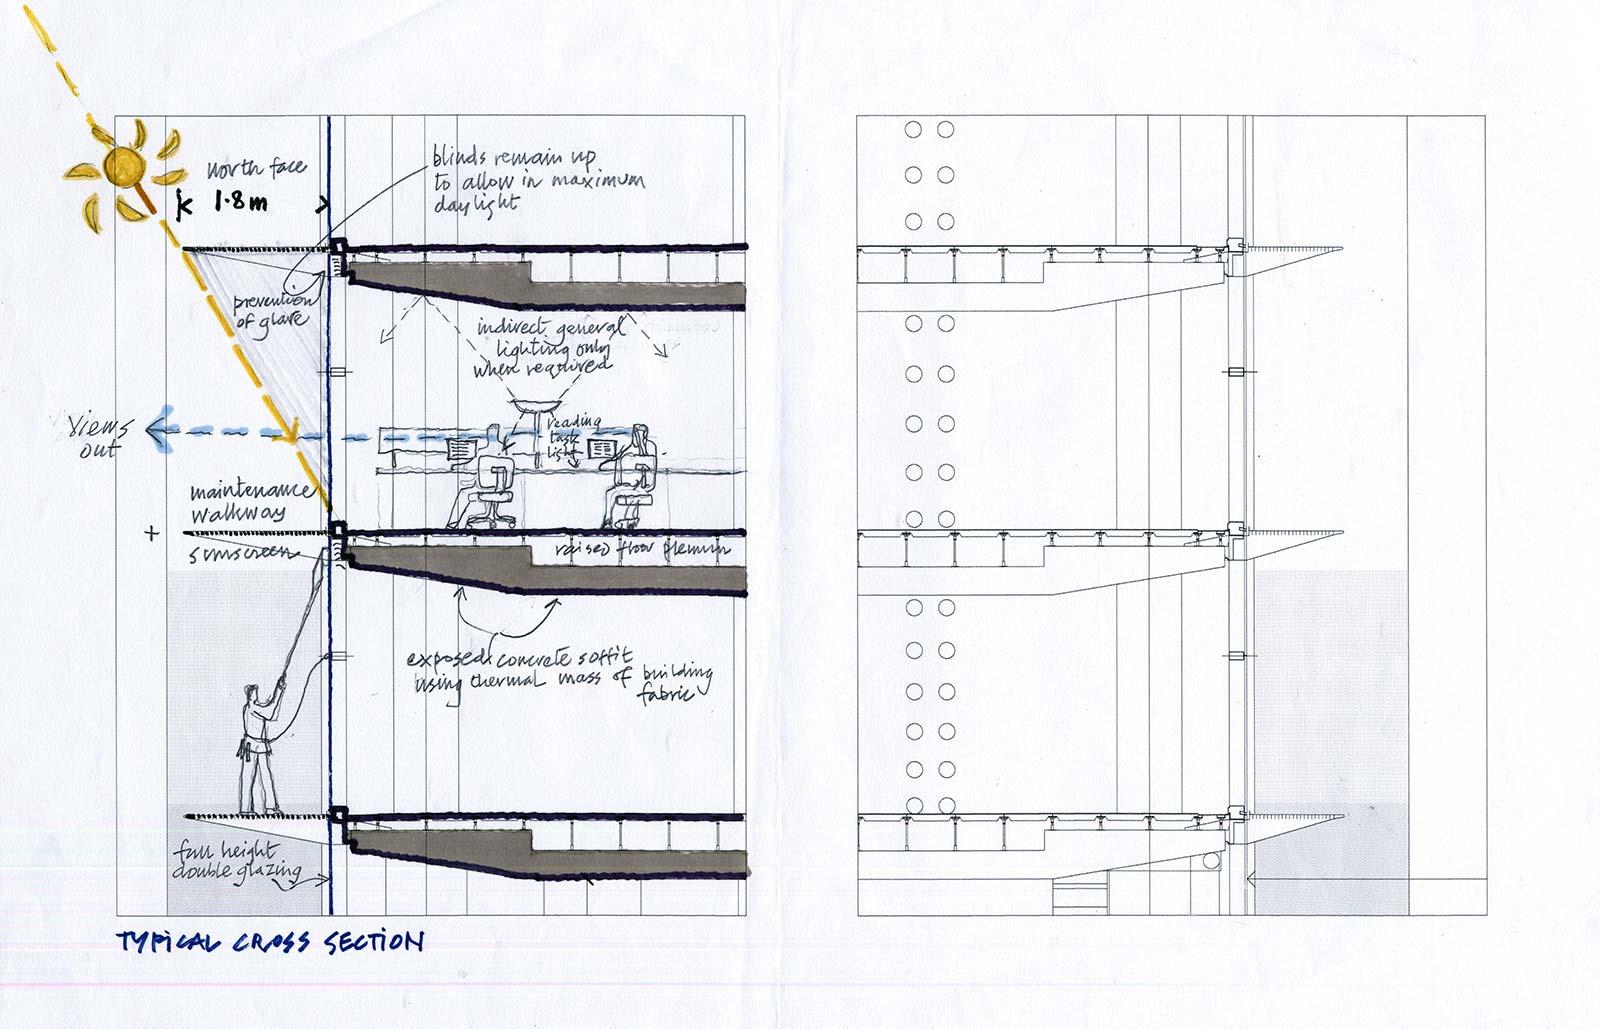 the-mauritius-commercial-bank-ebene-jean-francois-koenig-sectional-details